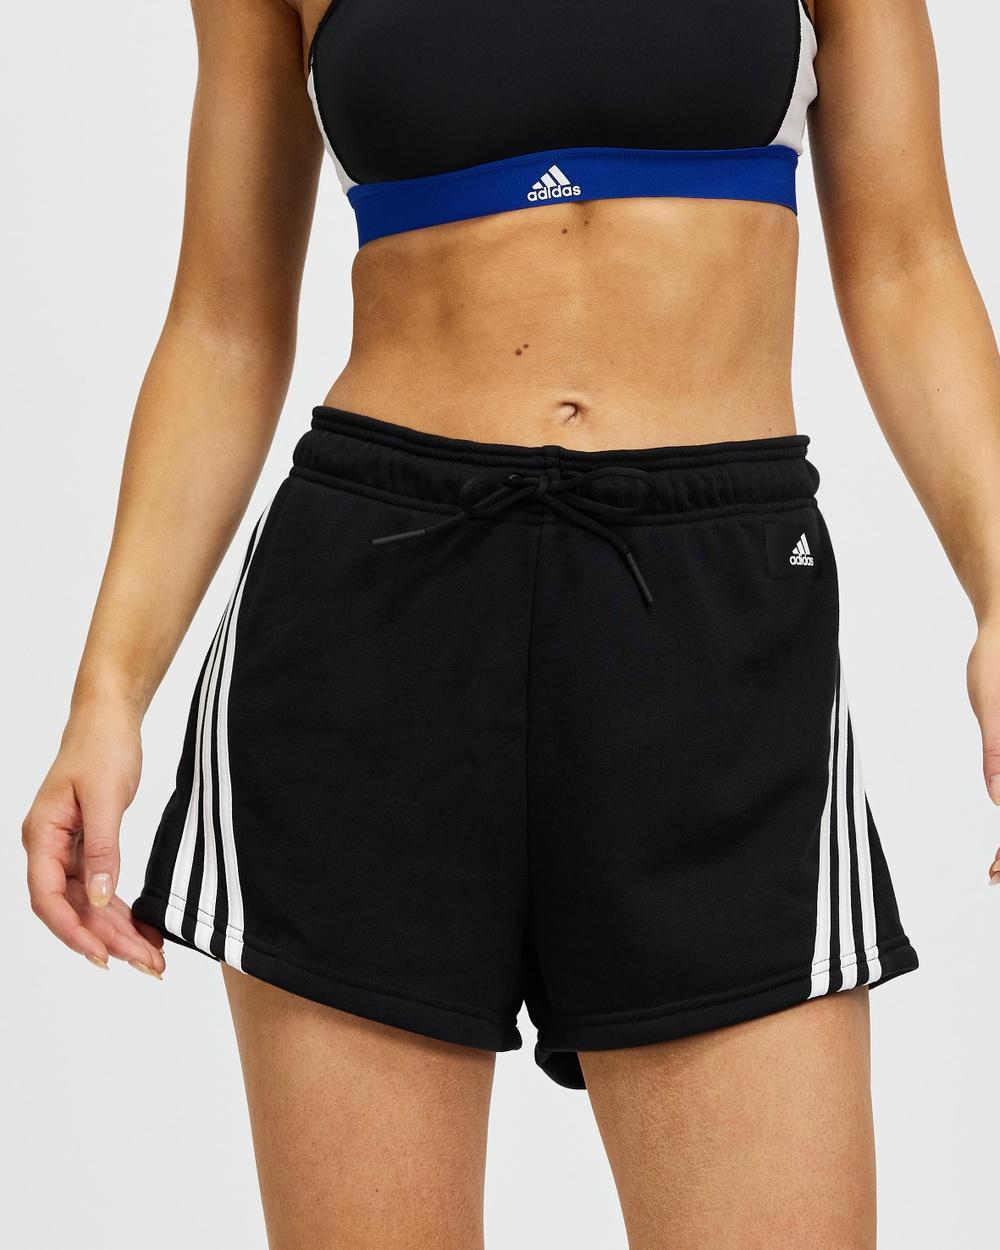 adidas Performance Sportswear Future Icons 3 Stripes Shorts Black 3-Stripes